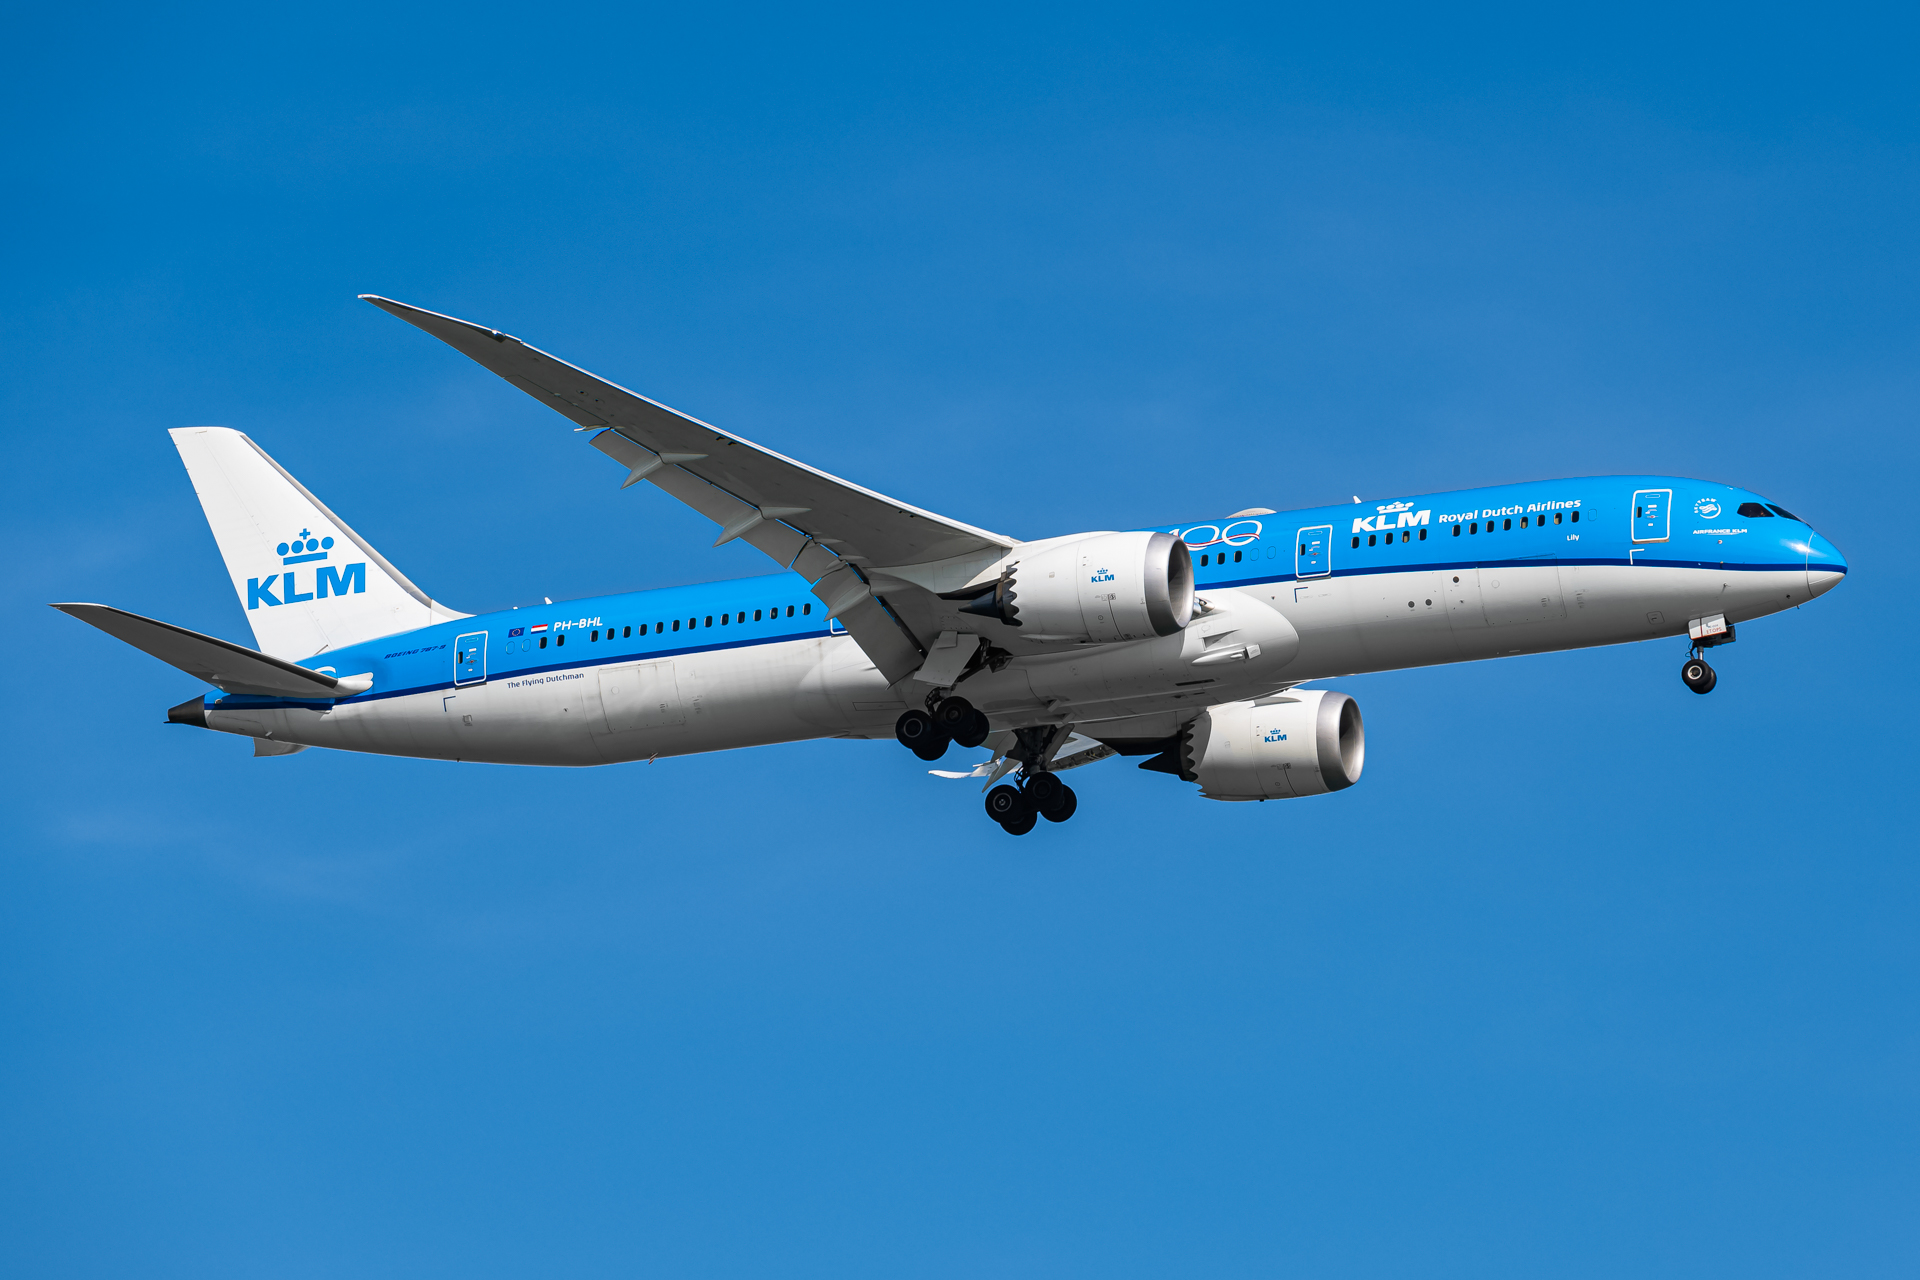 Photo of PH-BHL - KLM Boeing 787-9 at SIN